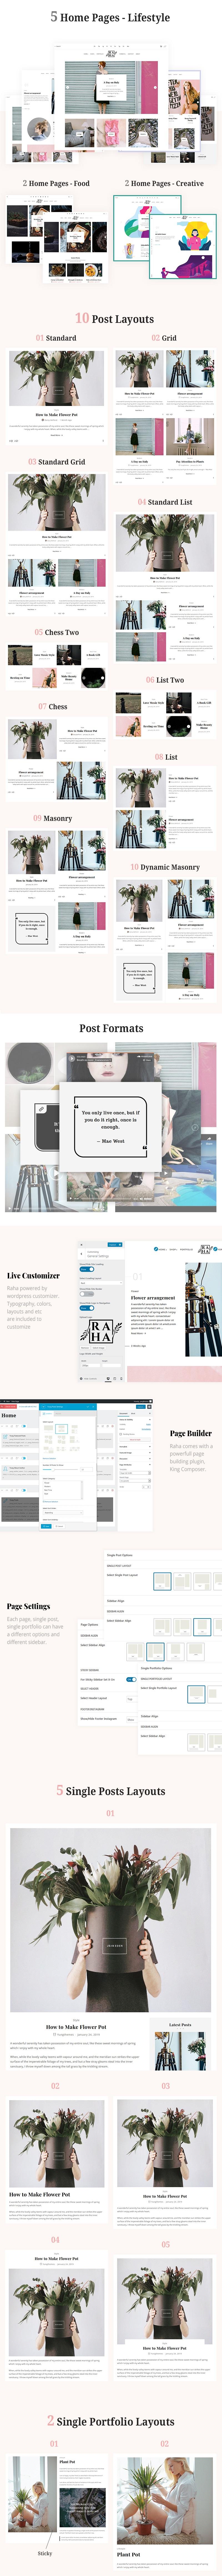 Raha - Kreatives WordPress-Theme - 1